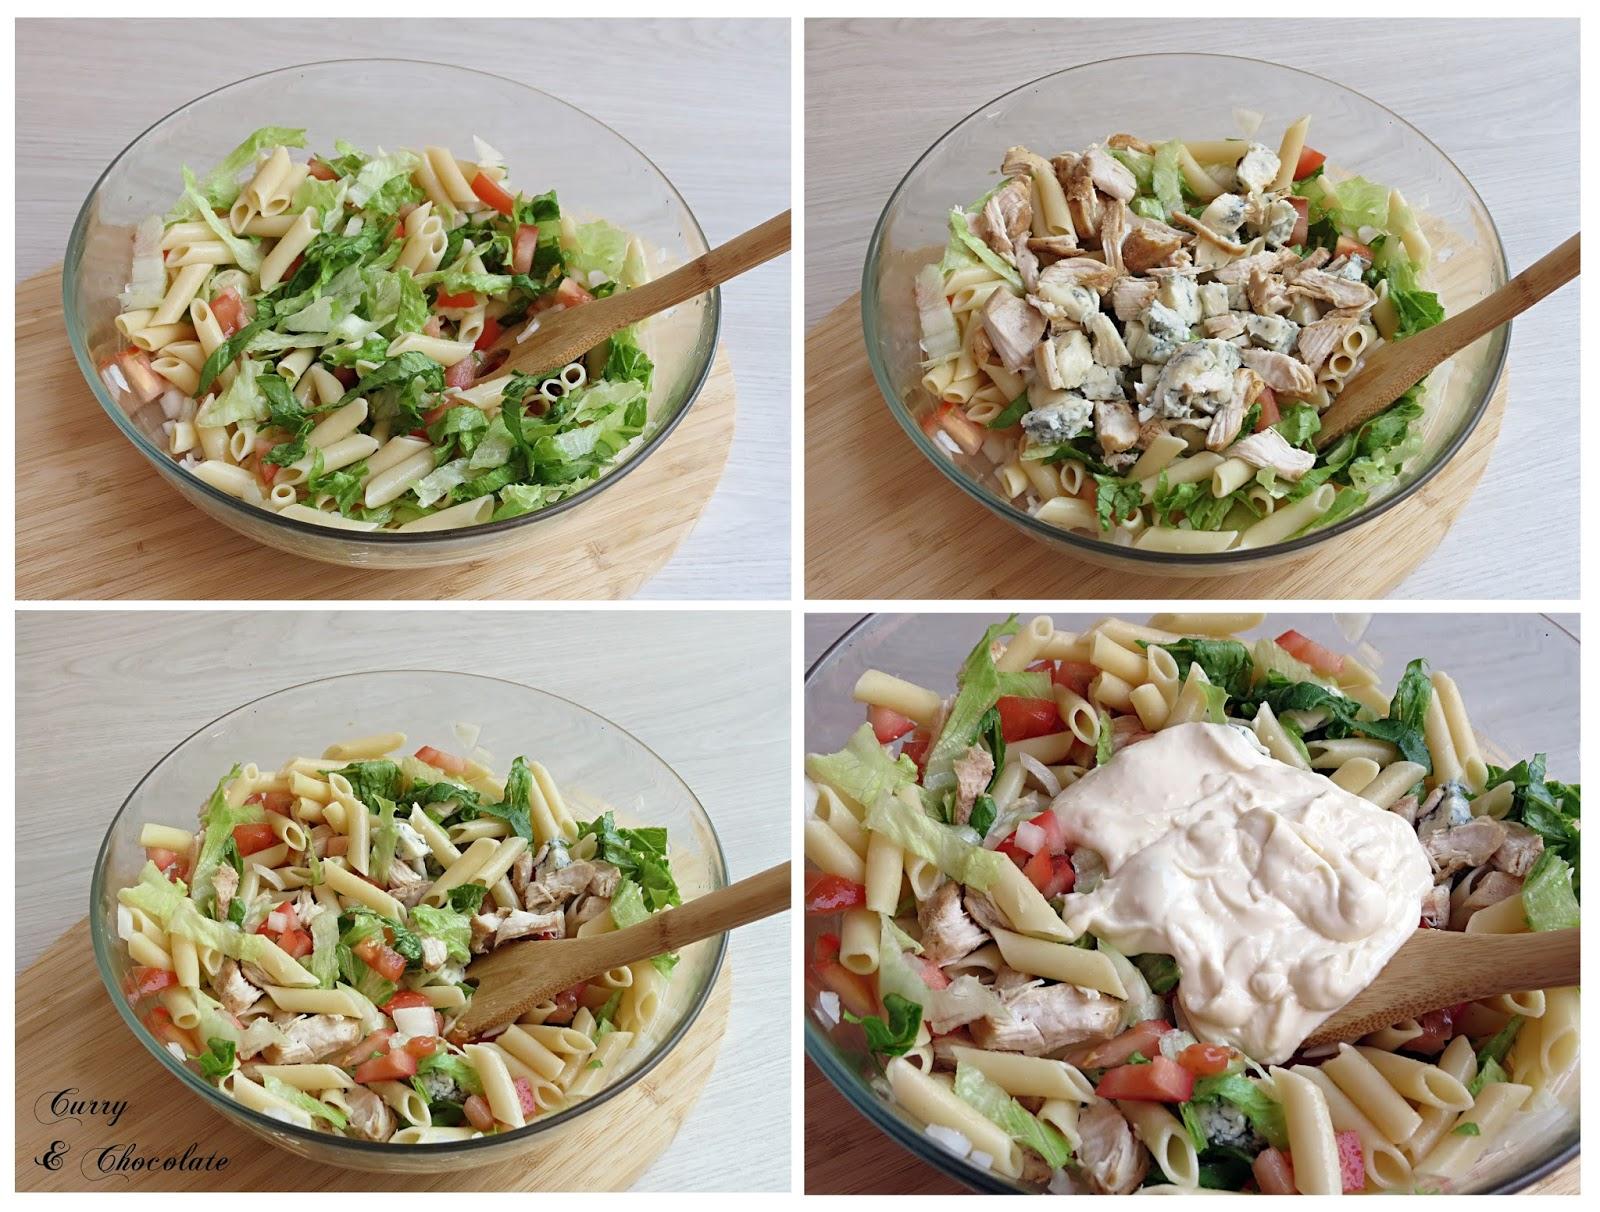 Montando la ensalada